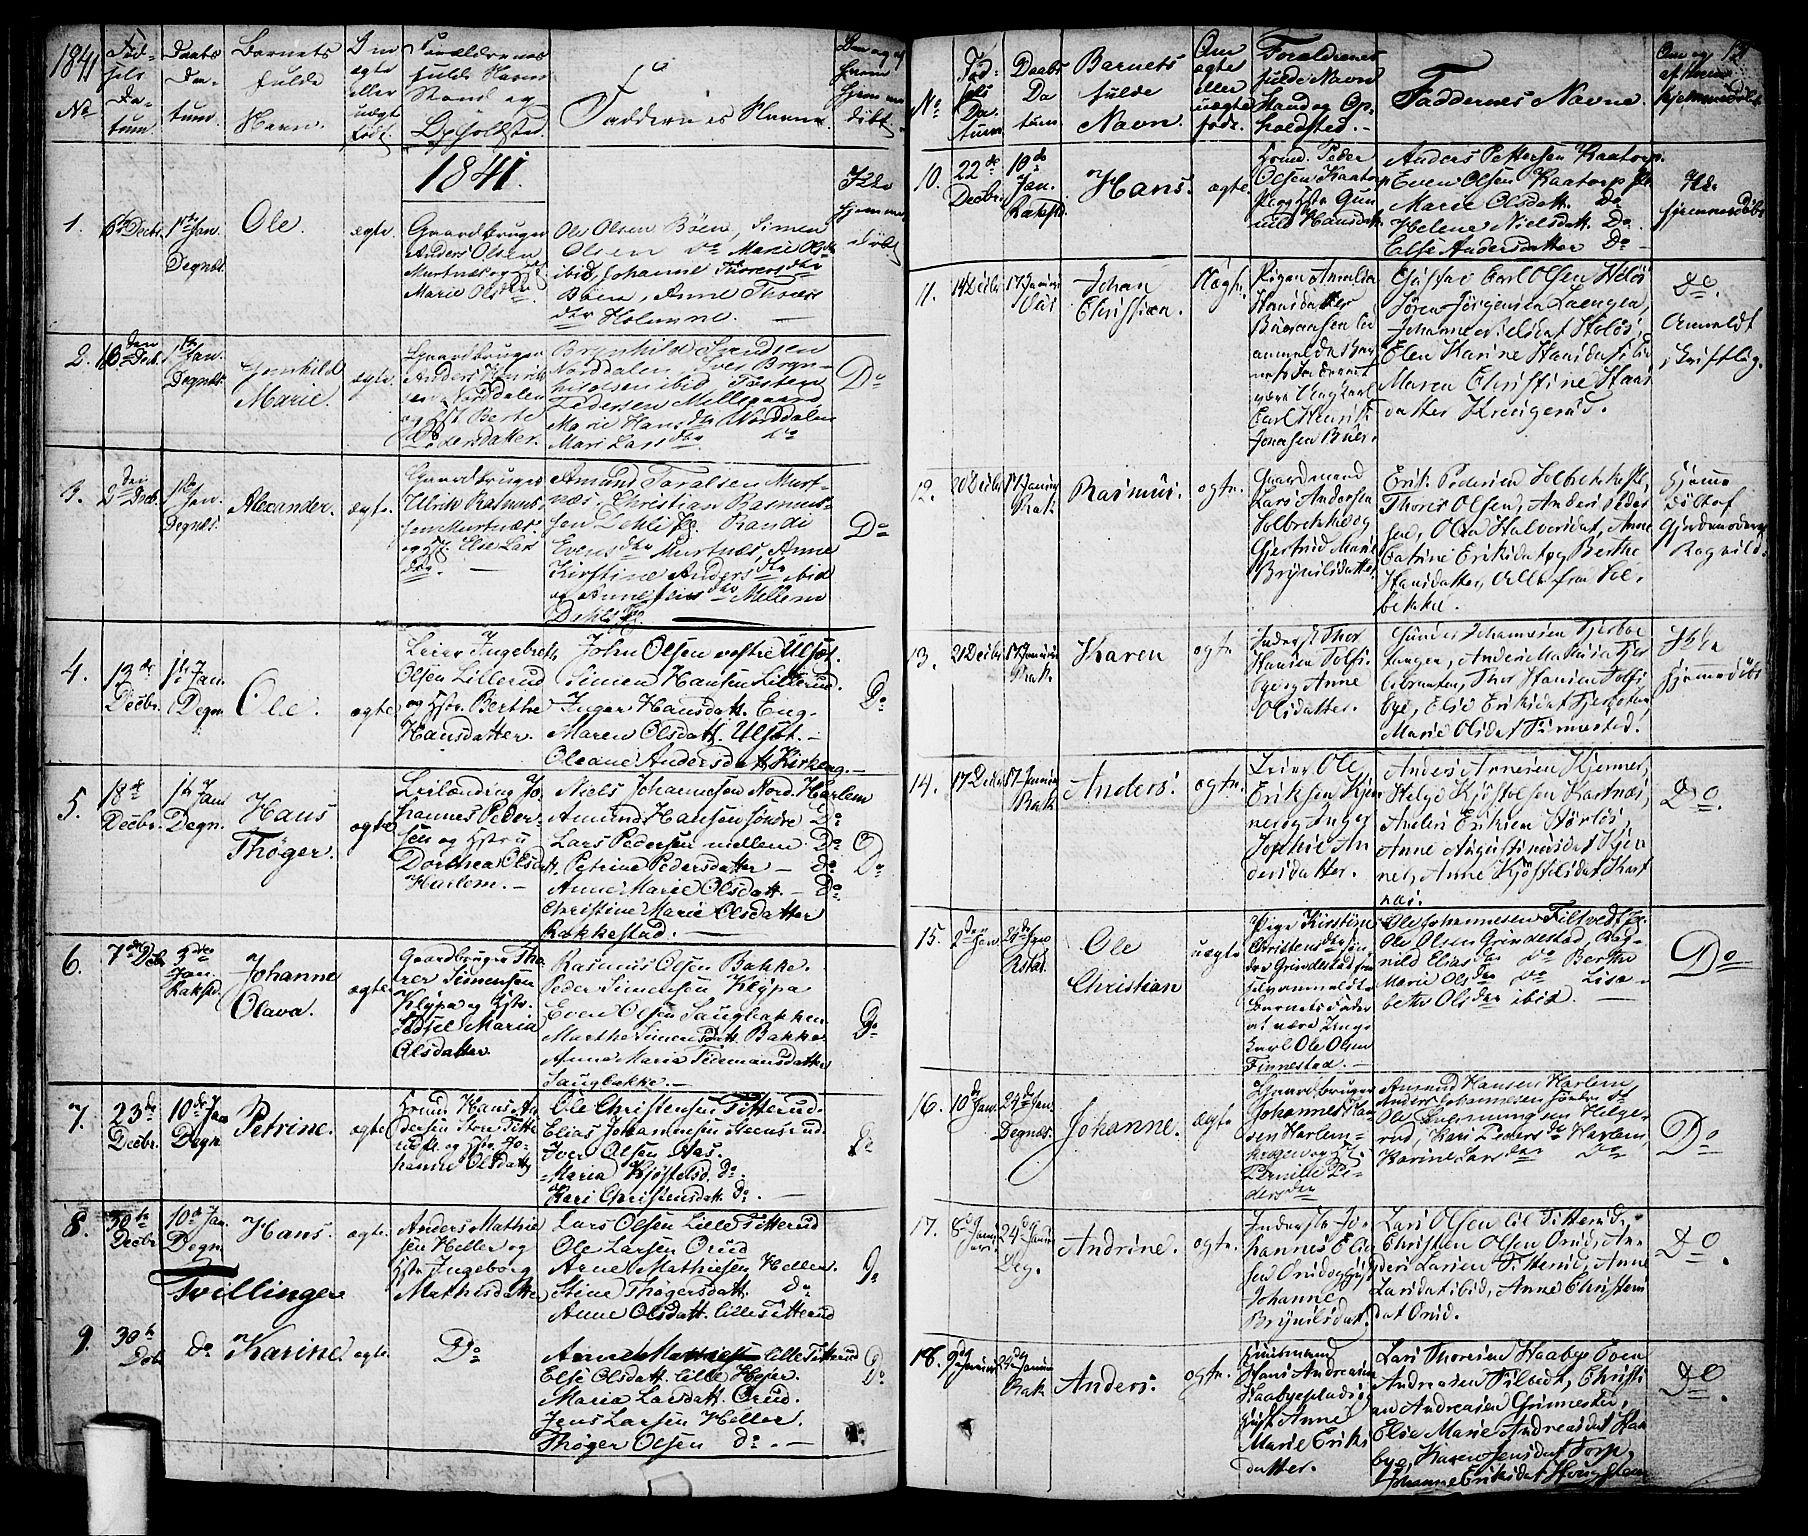 SAO, Rakkestad prestekontor Kirkebøker, F/Fa/L0007: Ministerialbok nr. I 7, 1825-1841, s. 131